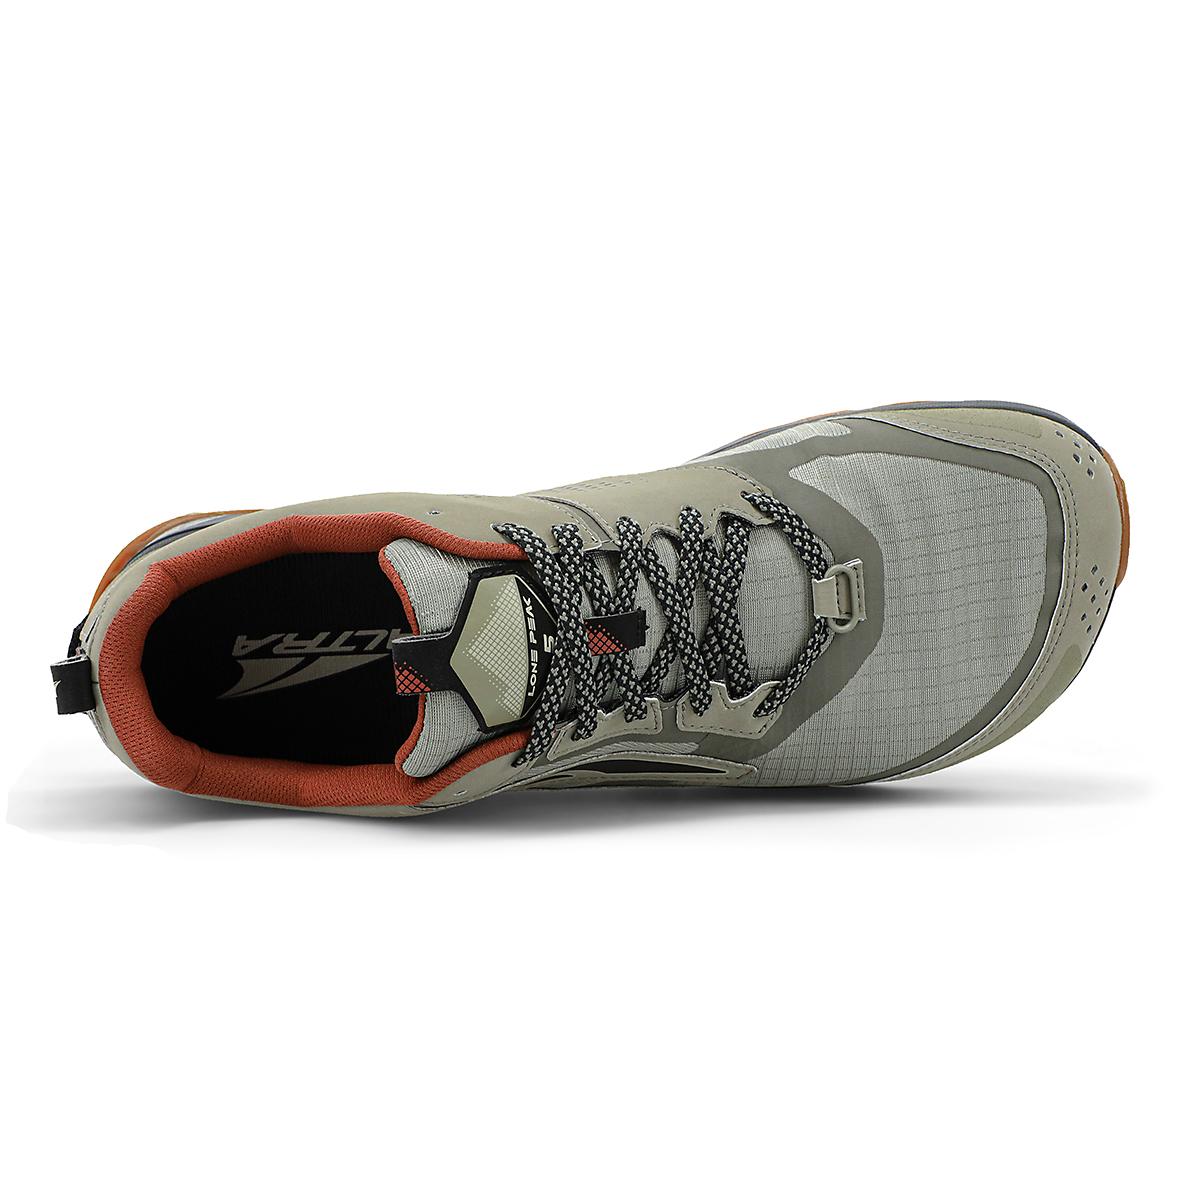 Men's Altra Lone Peak 5 Trail Running Shoe - Color: Khaki - Size: 7 - Width: Regular, Khaki, large, image 3